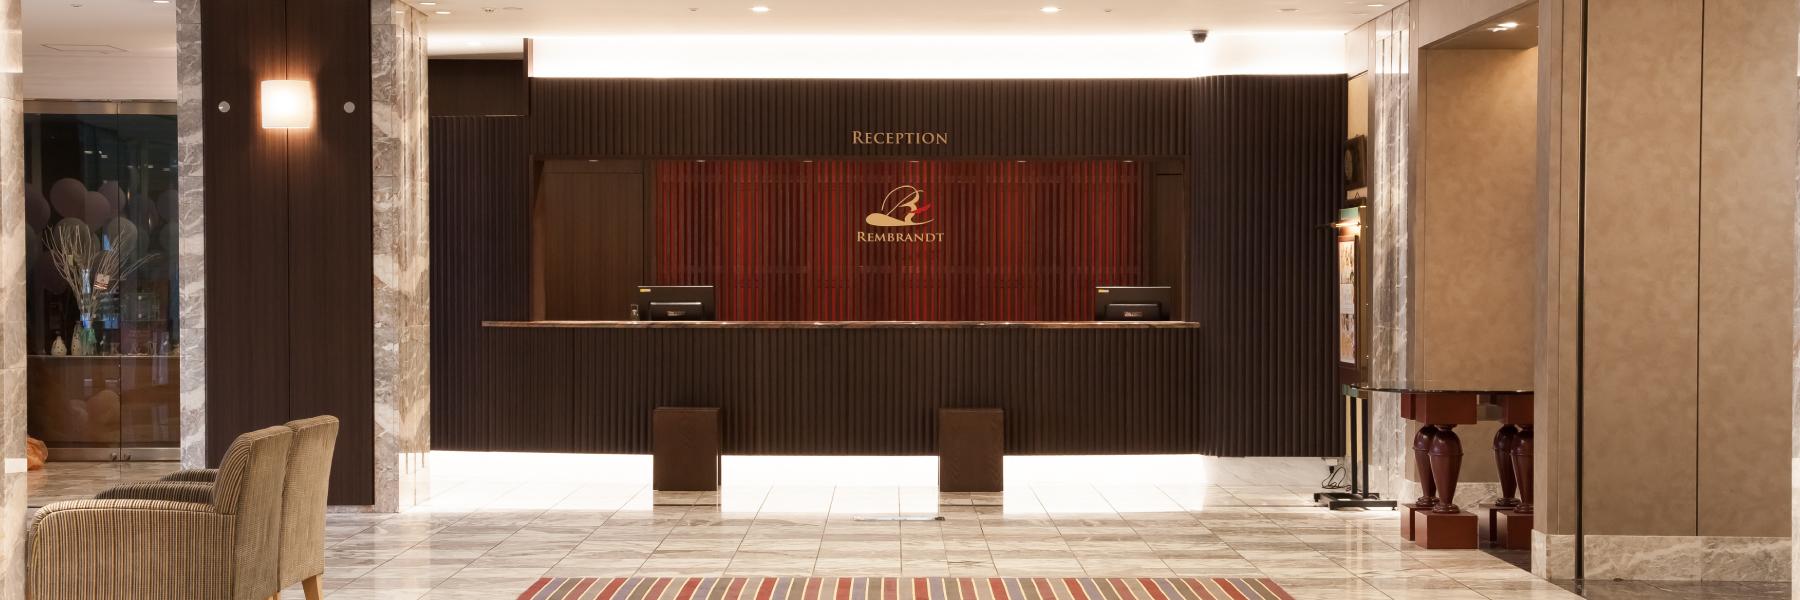 THANKS|レンブラントホテル海老名【公式】レンブラントグループホテル